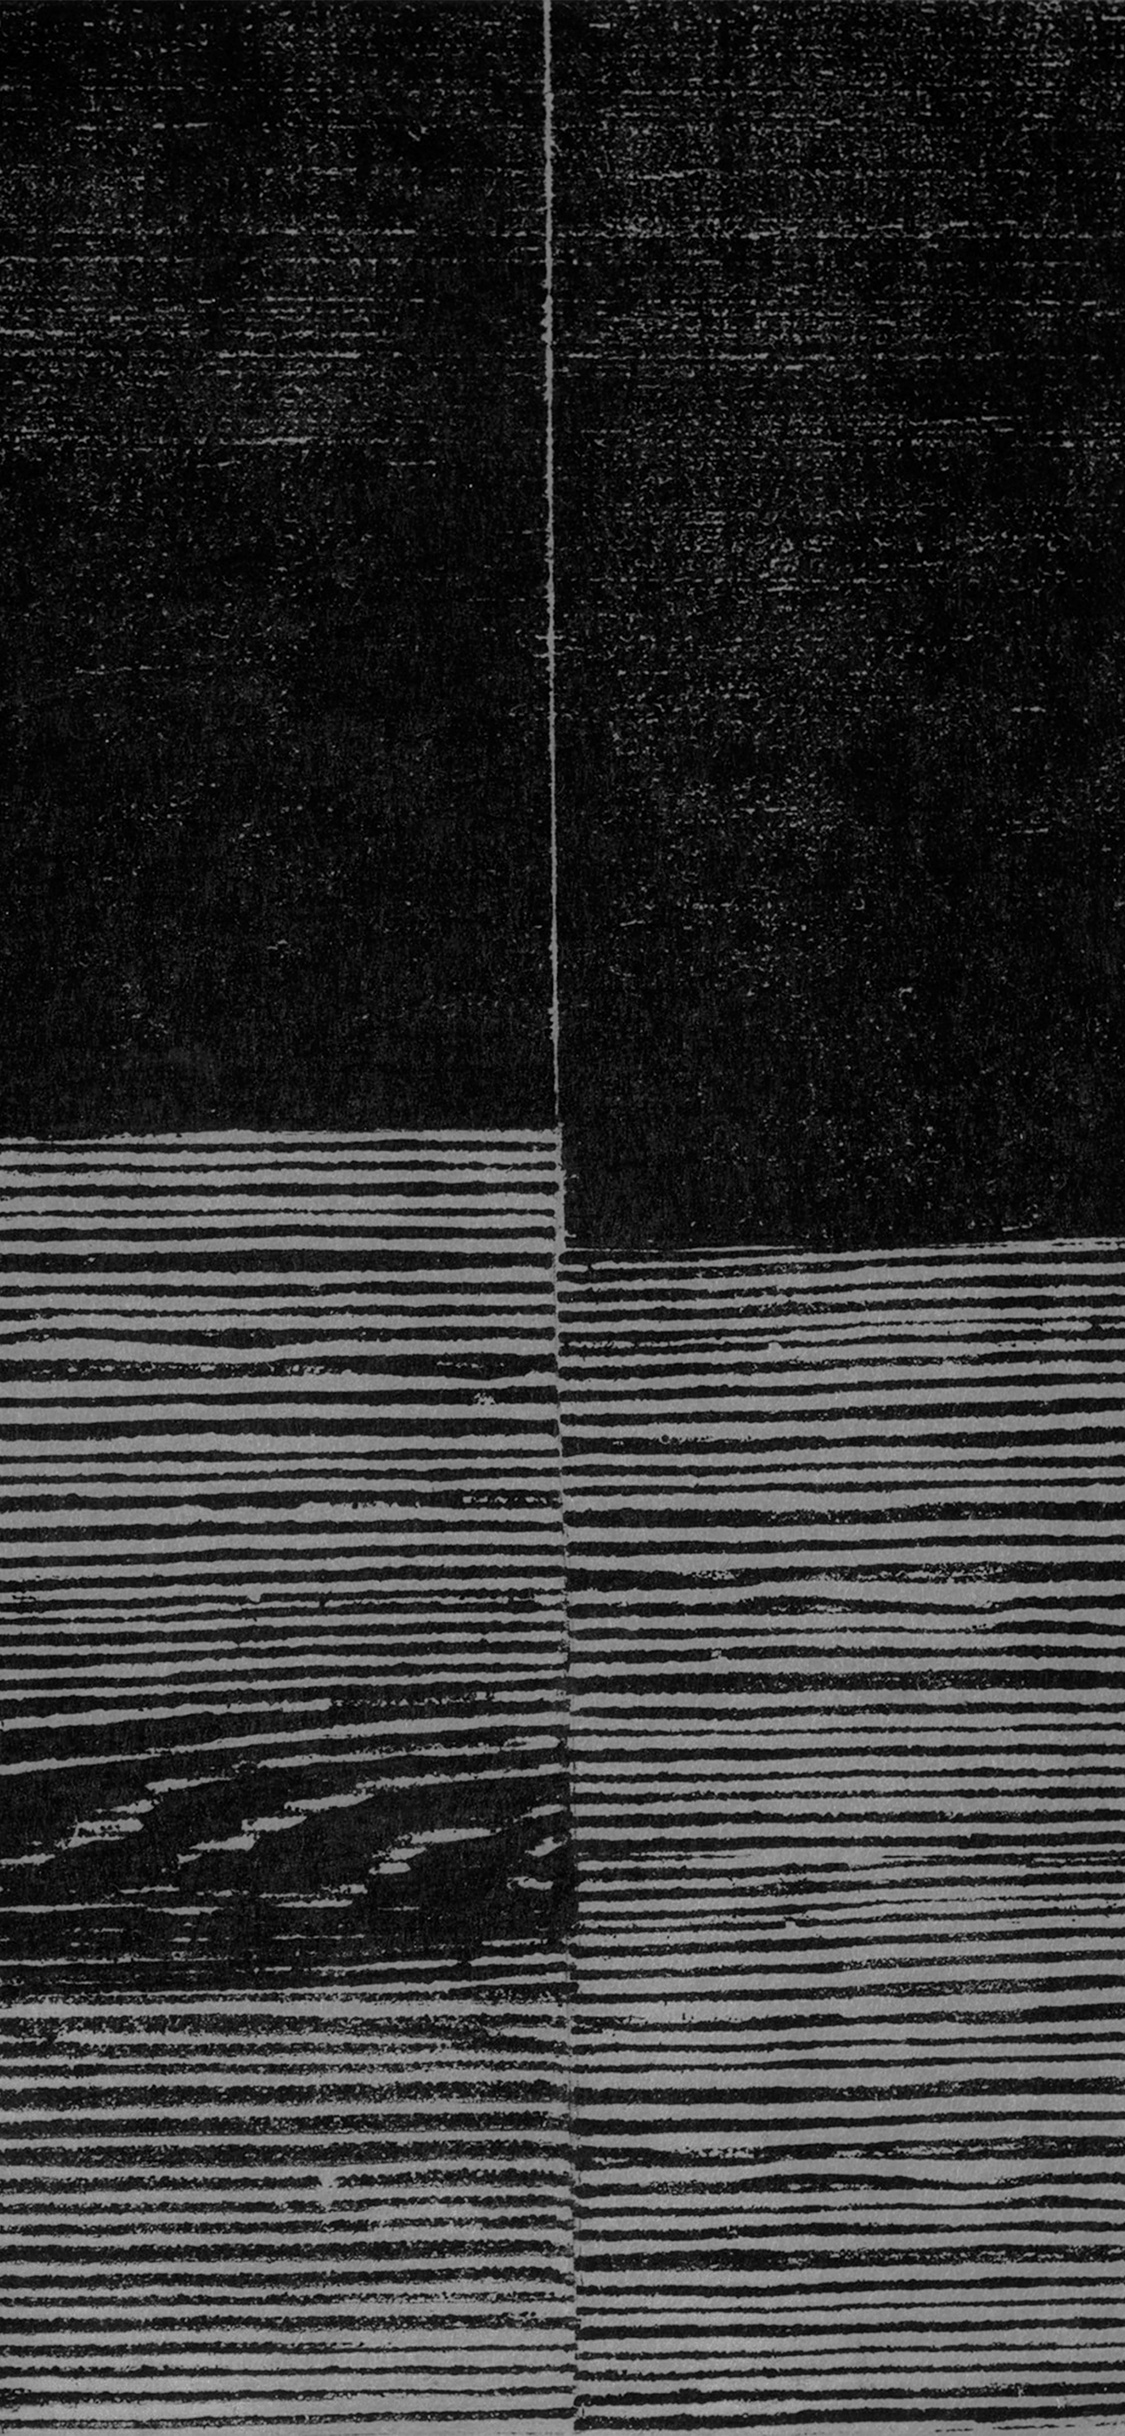 vp73 wood paint dark bw pattern texture